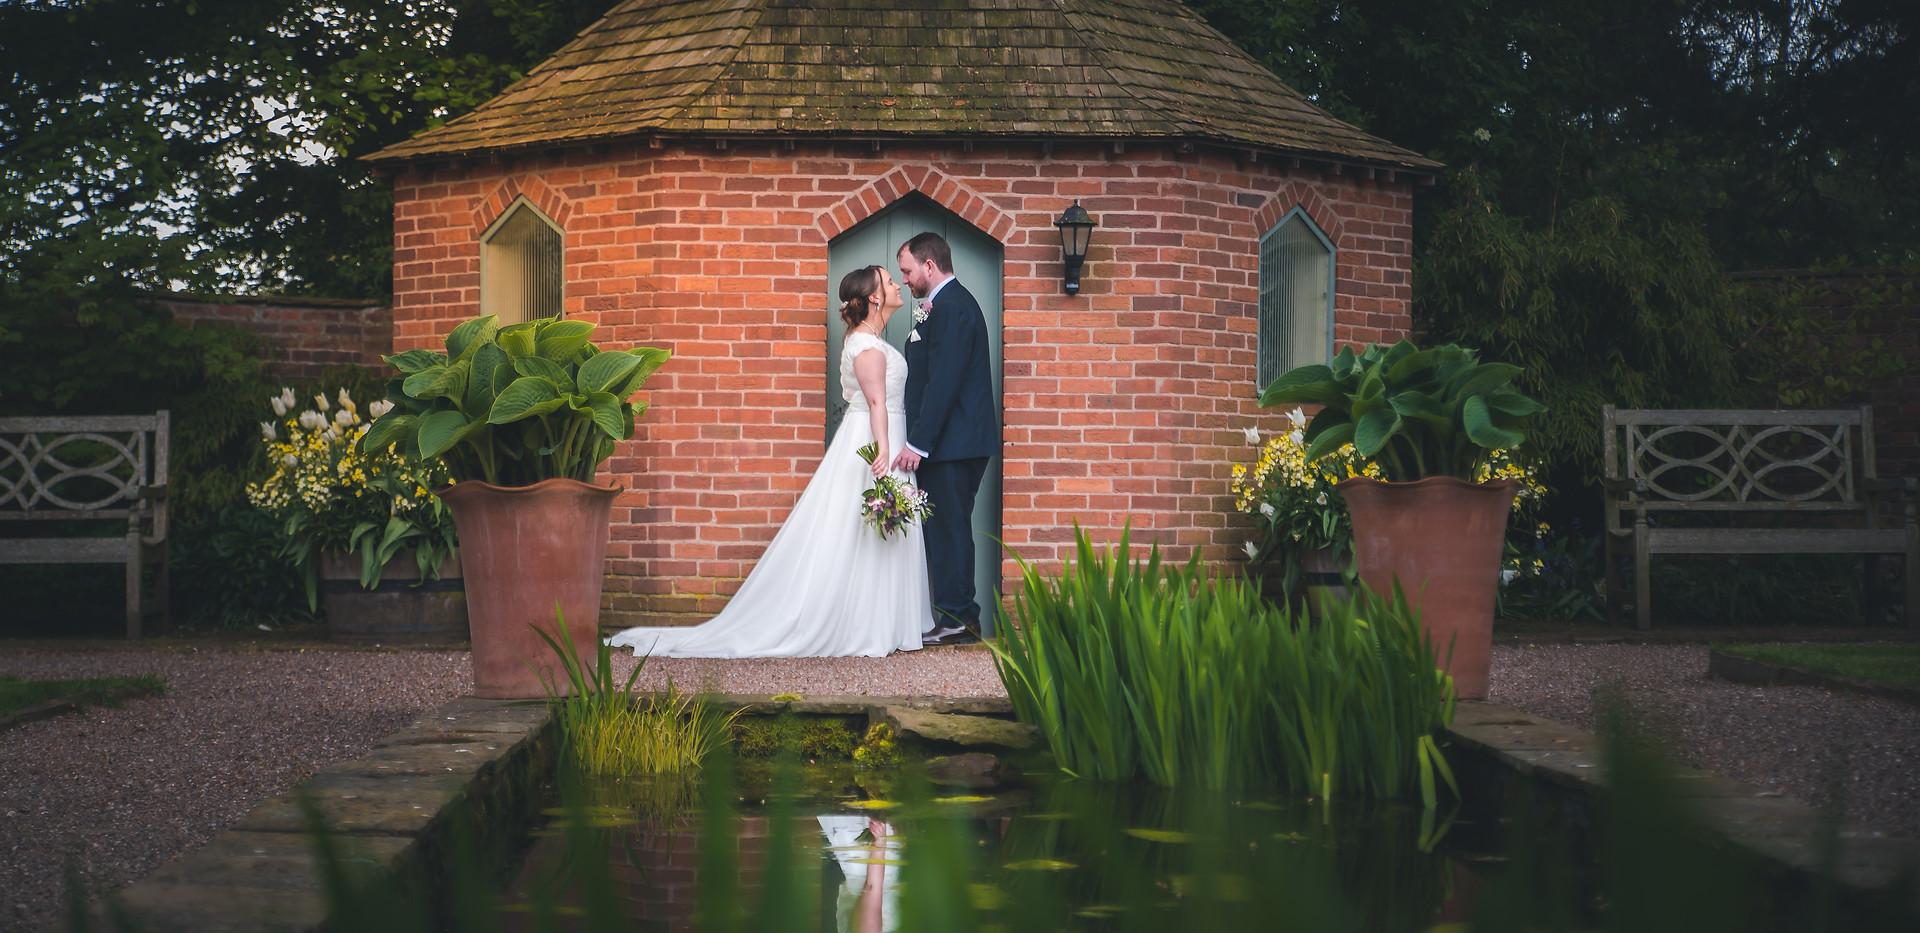 Abbeywood Wedding Photographer_21.jpg